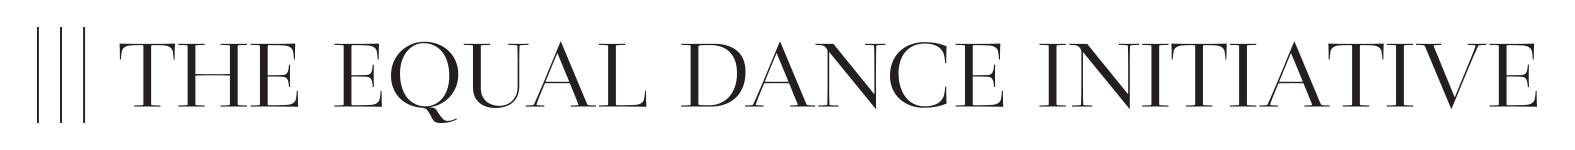 edi-logo-black-300dpi.png